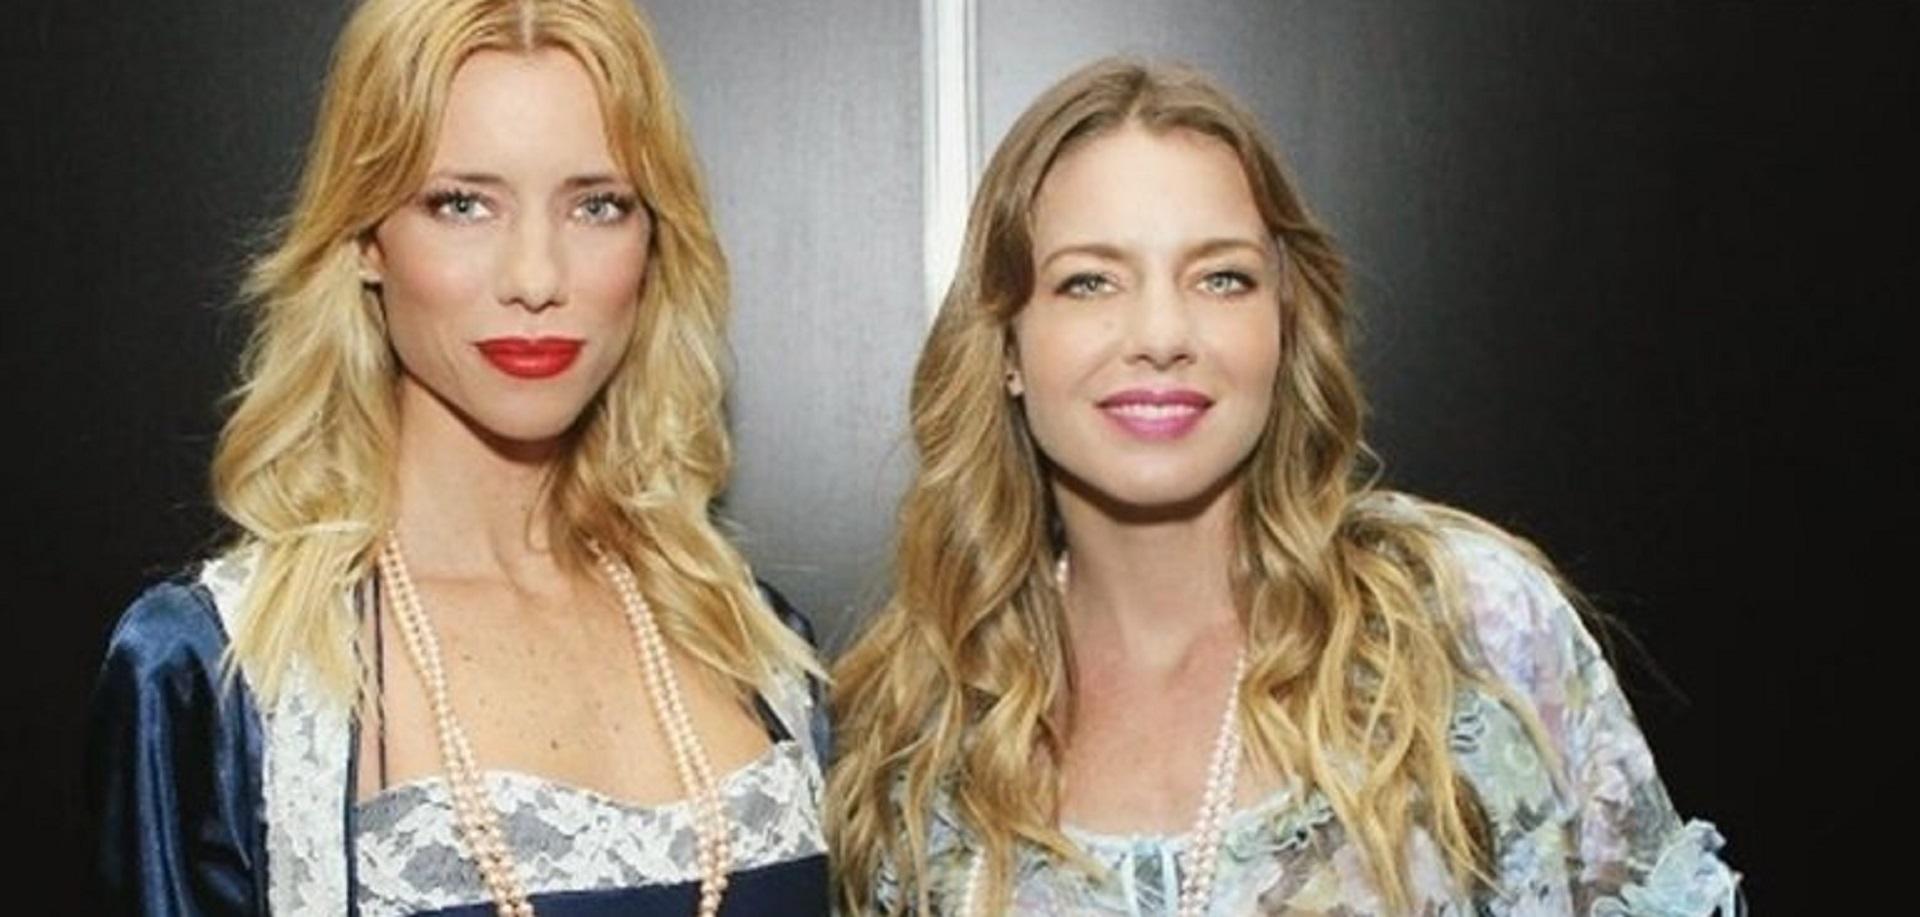 Nicole y su hermana, Geraldine Neumann